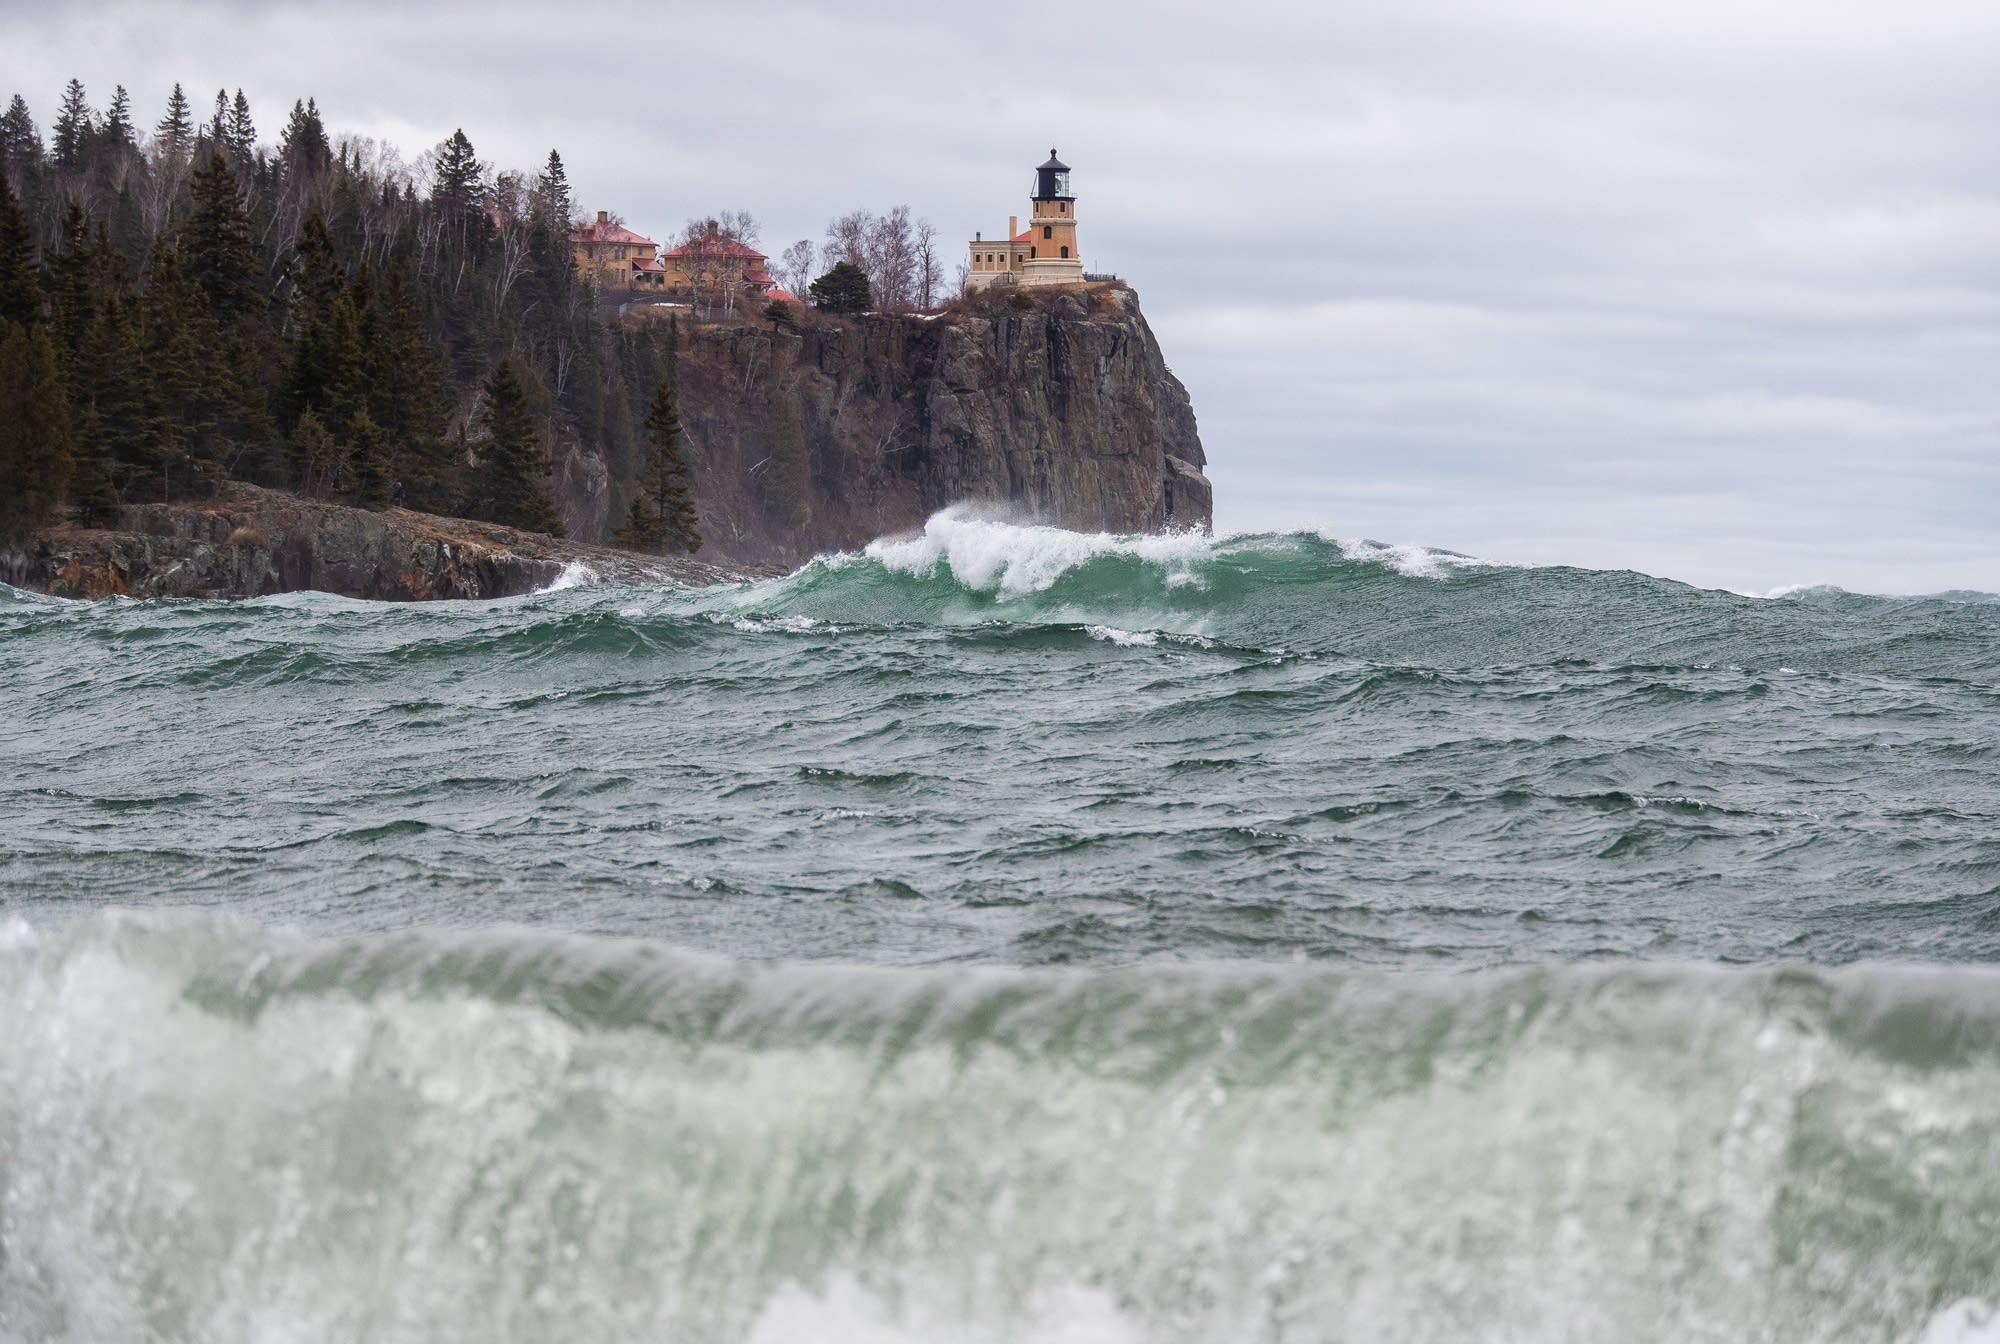 Wind and waves lash the shoreline of Split Rock State Park April 11, 2019